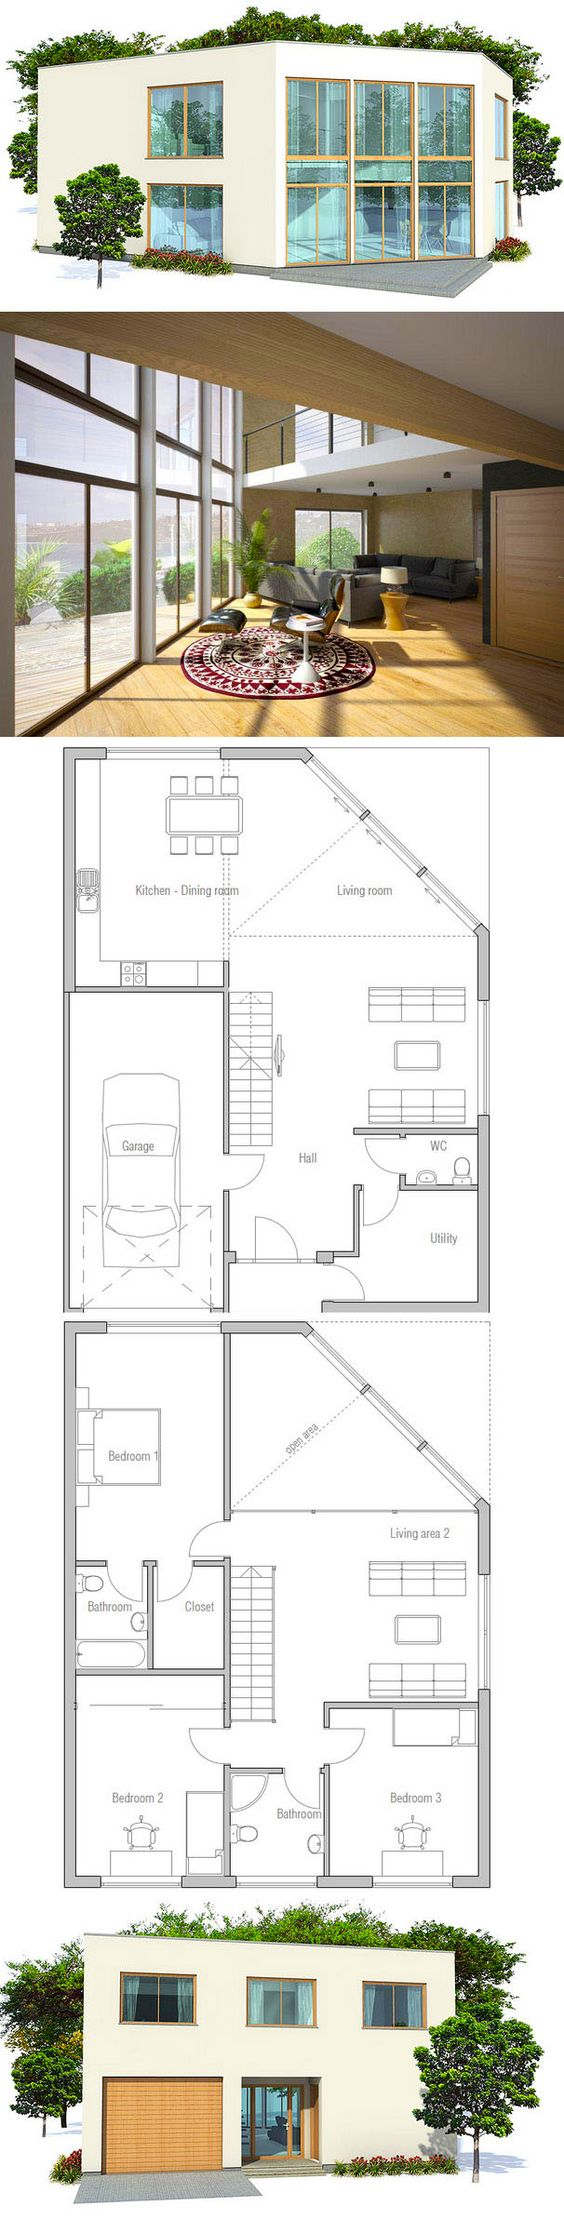 Hausplan, modernes Haus Hauspläne Pinterest House plans ... size: 564 x 2219 post ID: 6 File size: 0 B